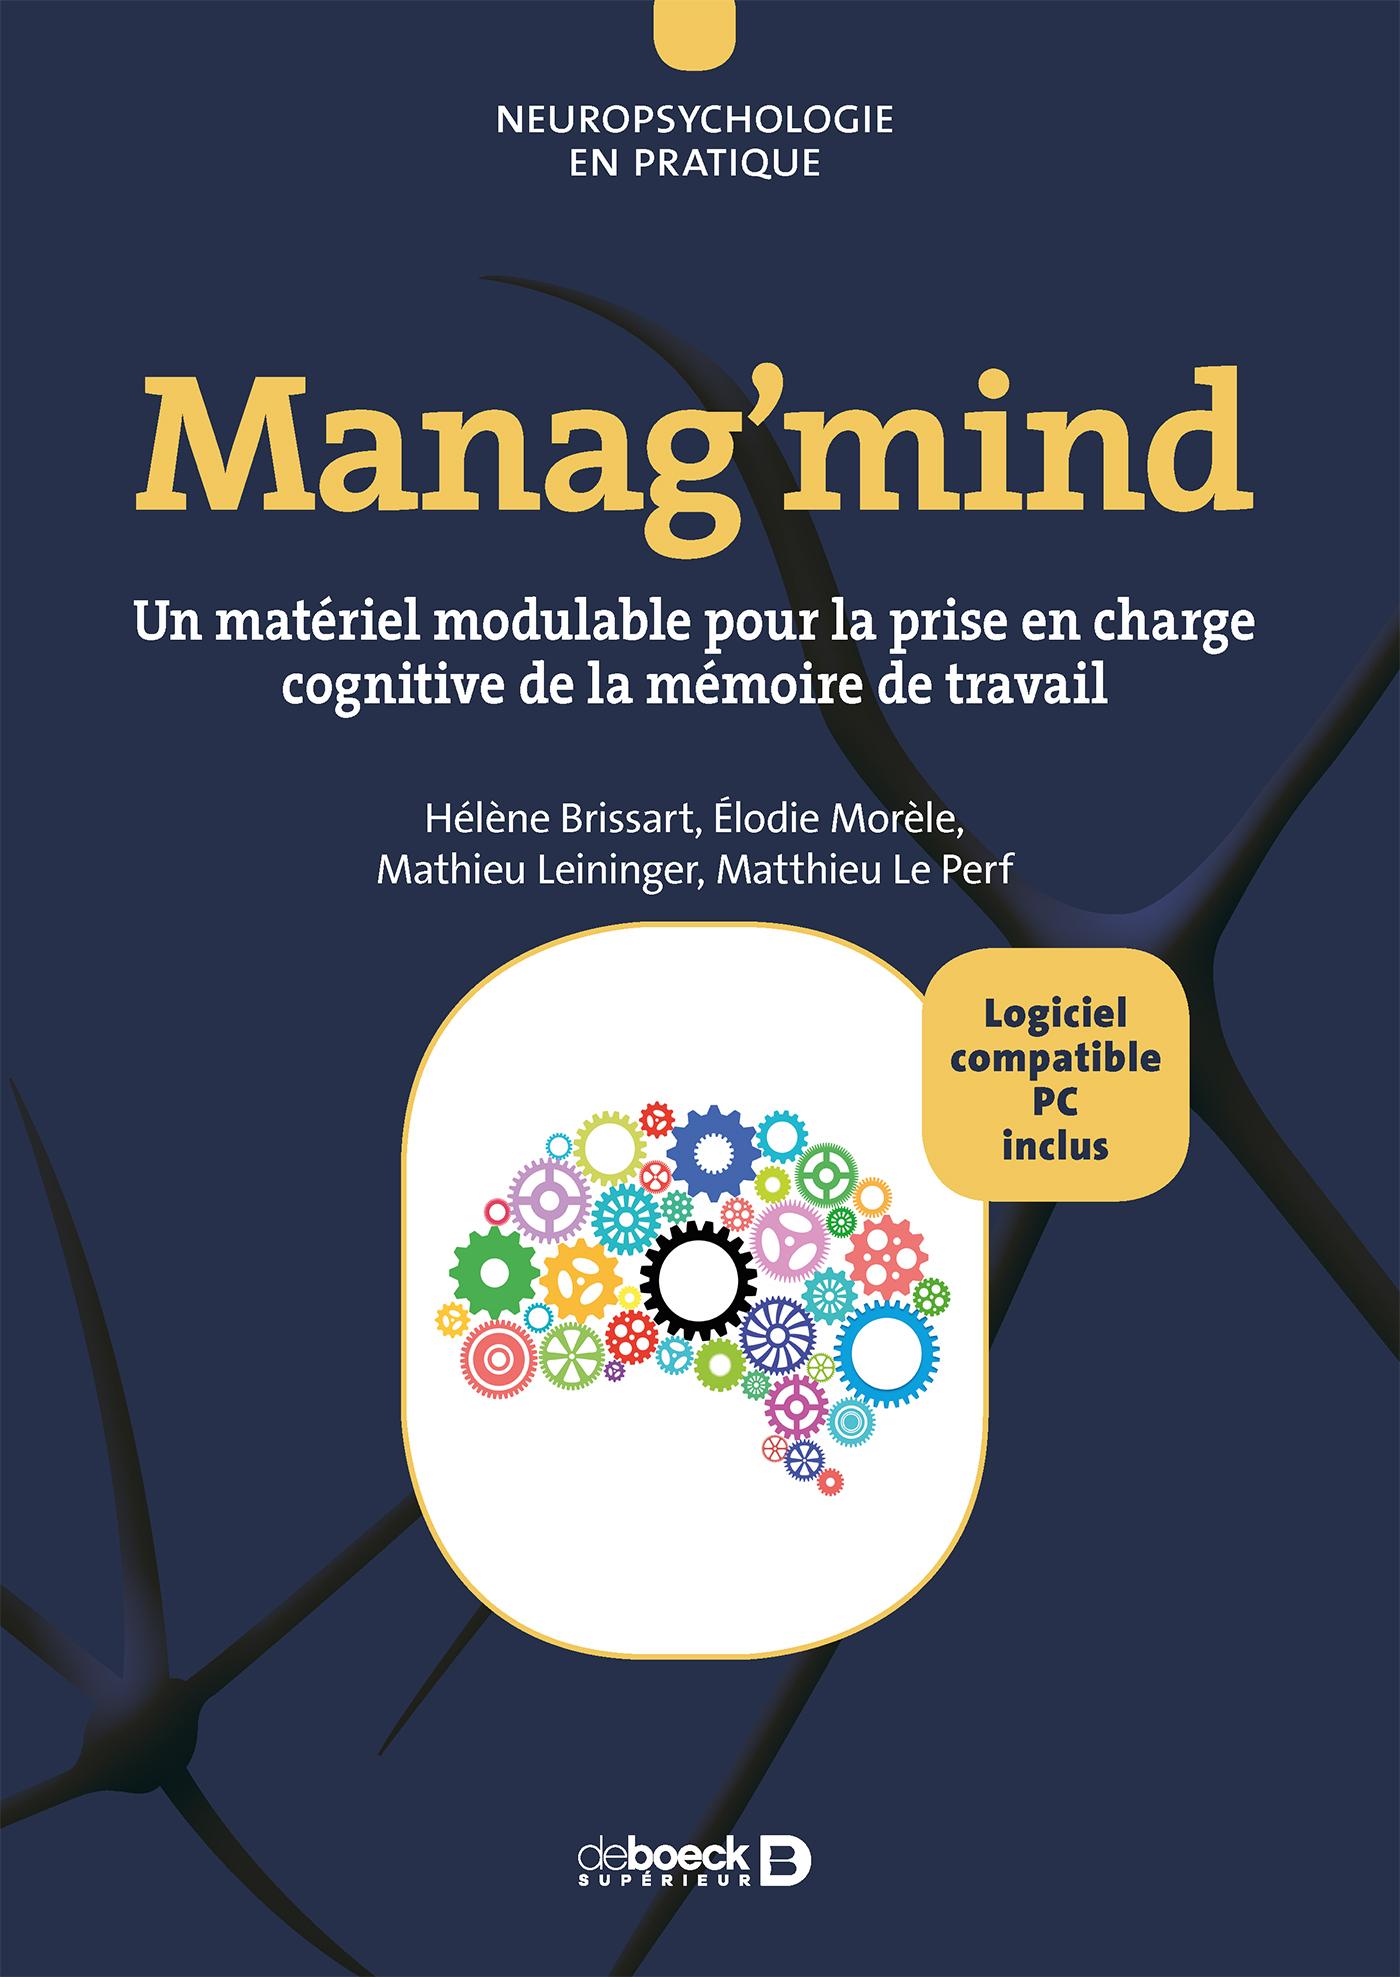 MANAG'MIND